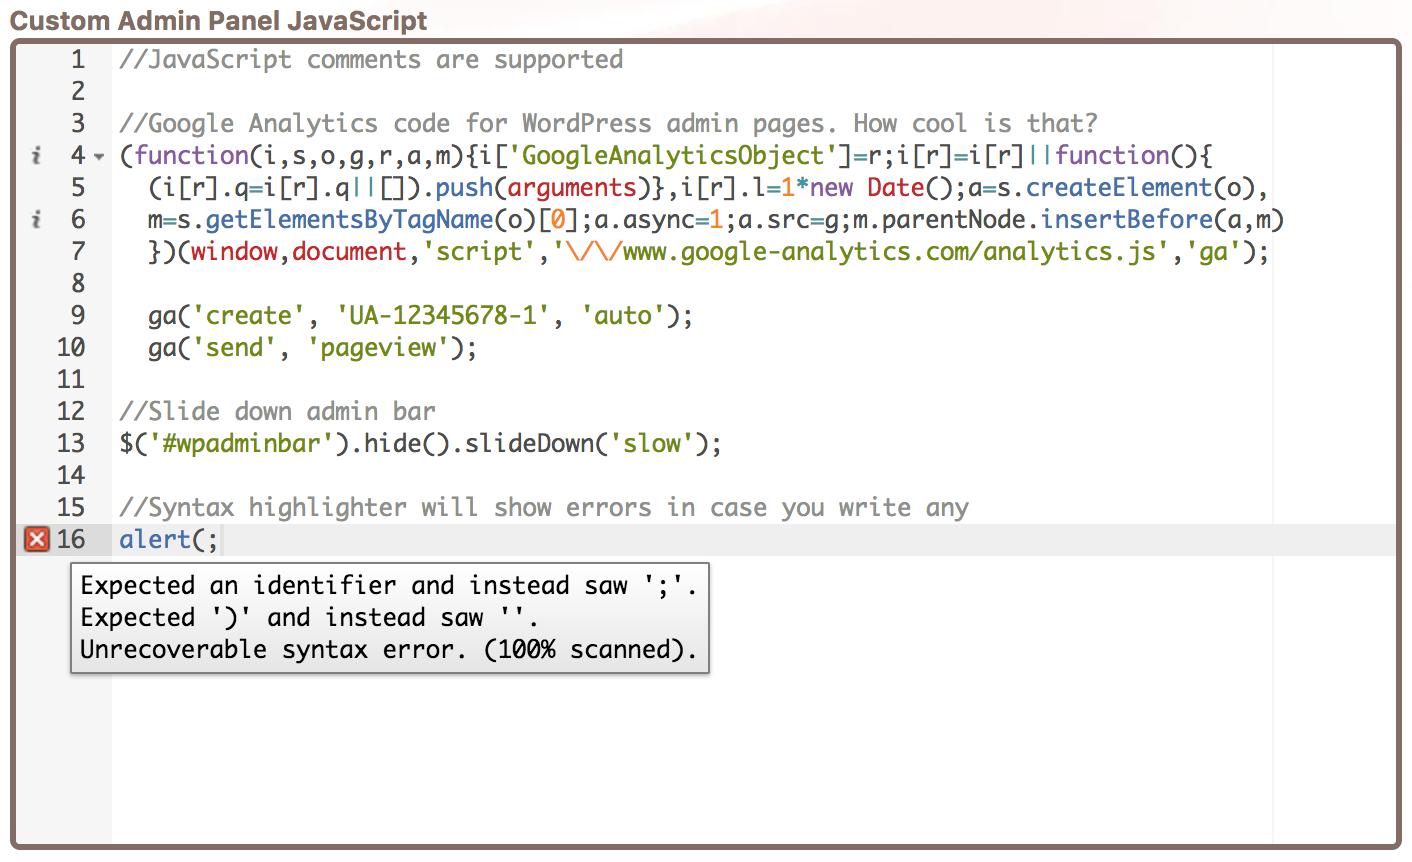 Custom WordPress Admin JavaScript - Cusmin